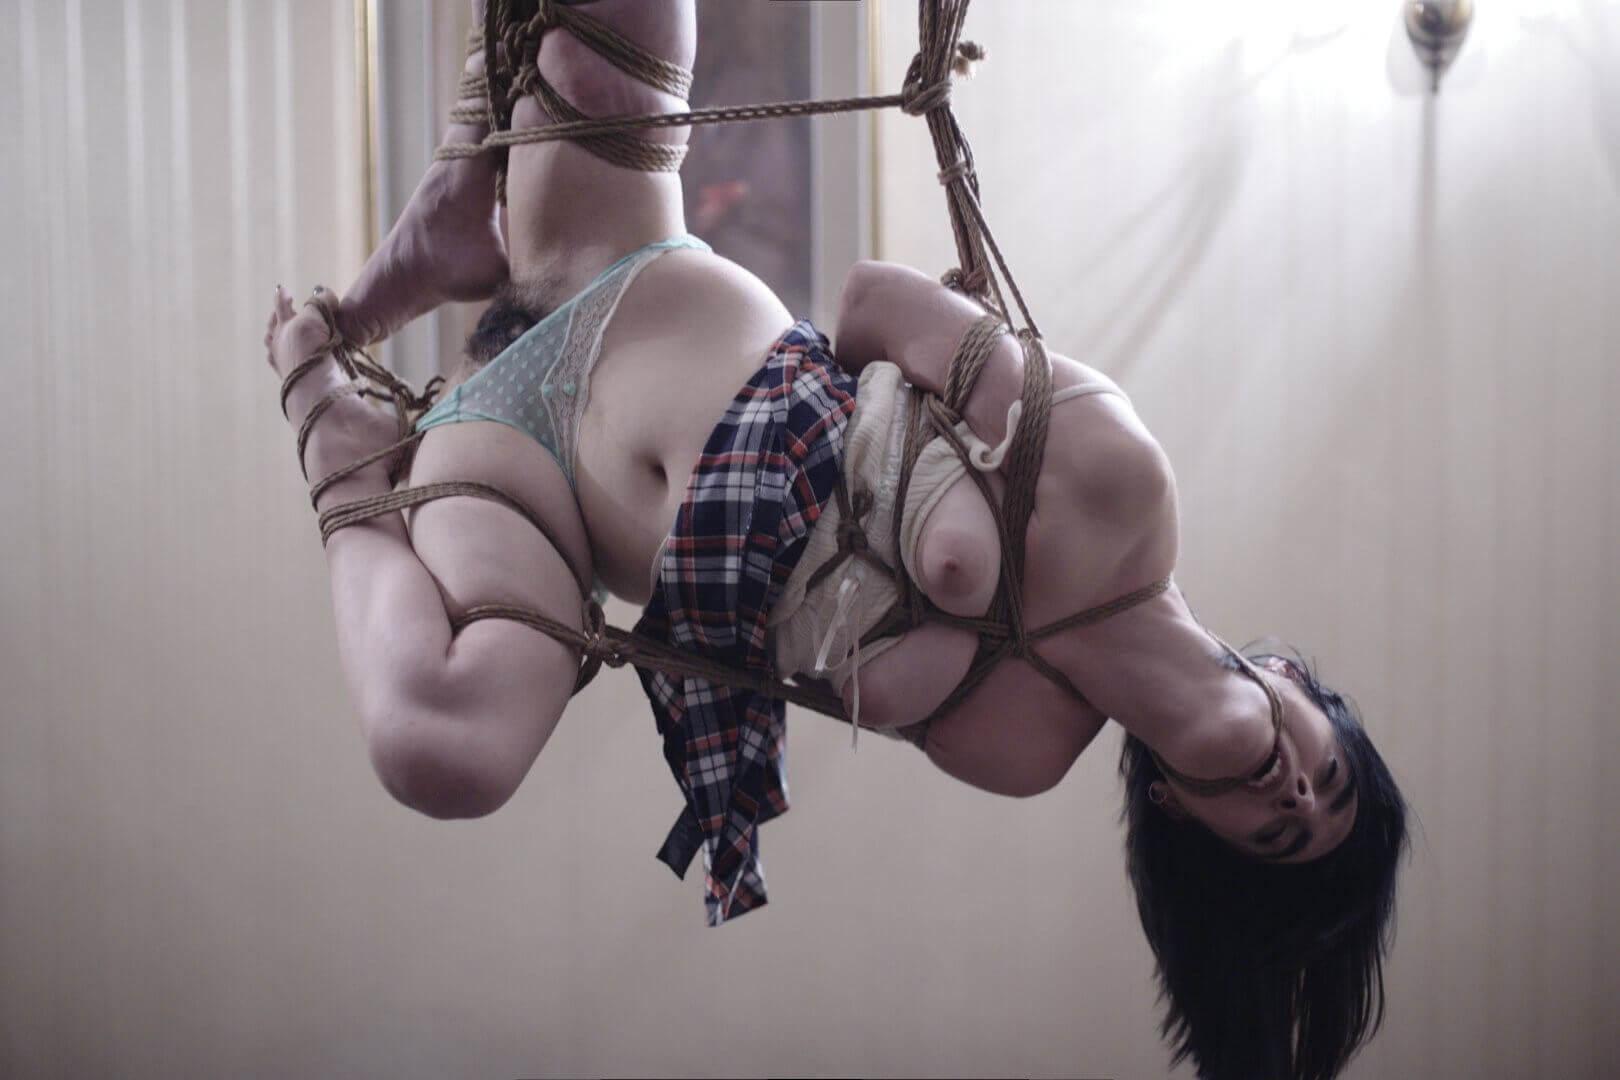 bondage rope videos x